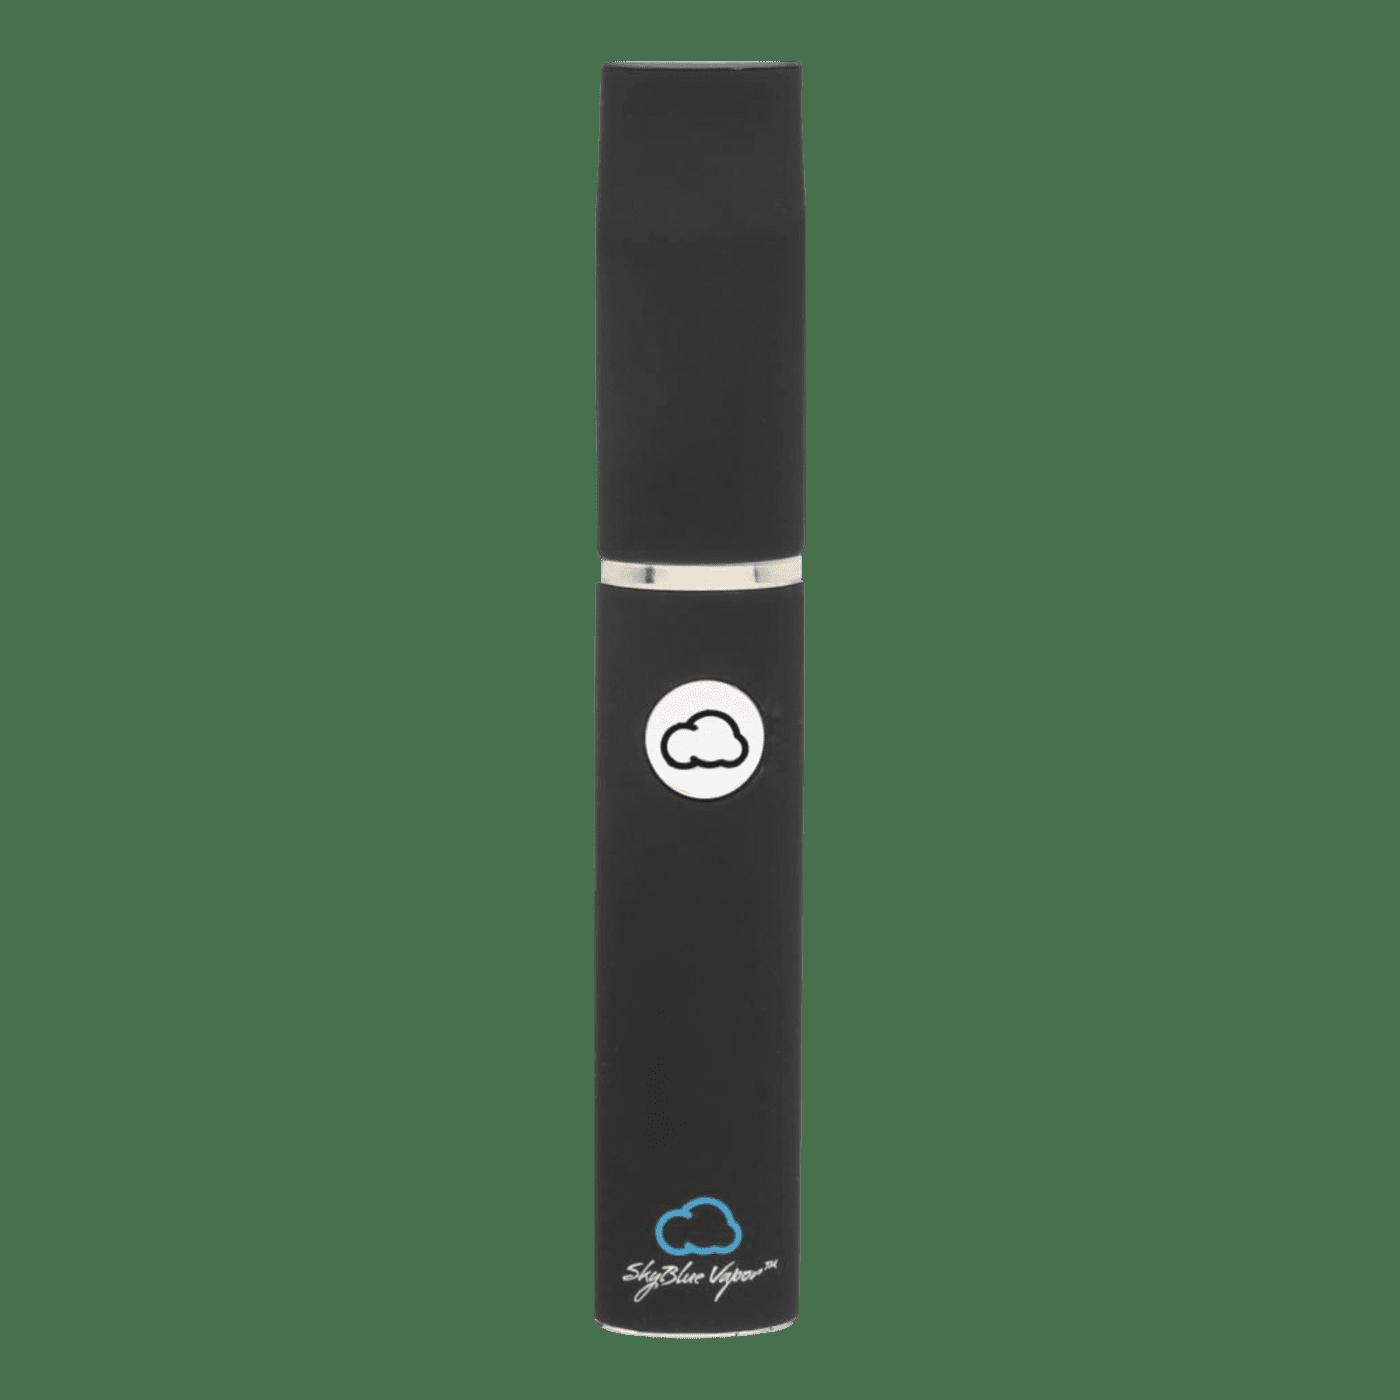 Buy SkyBlue Vapor Pen-vapor pen for weed for sale